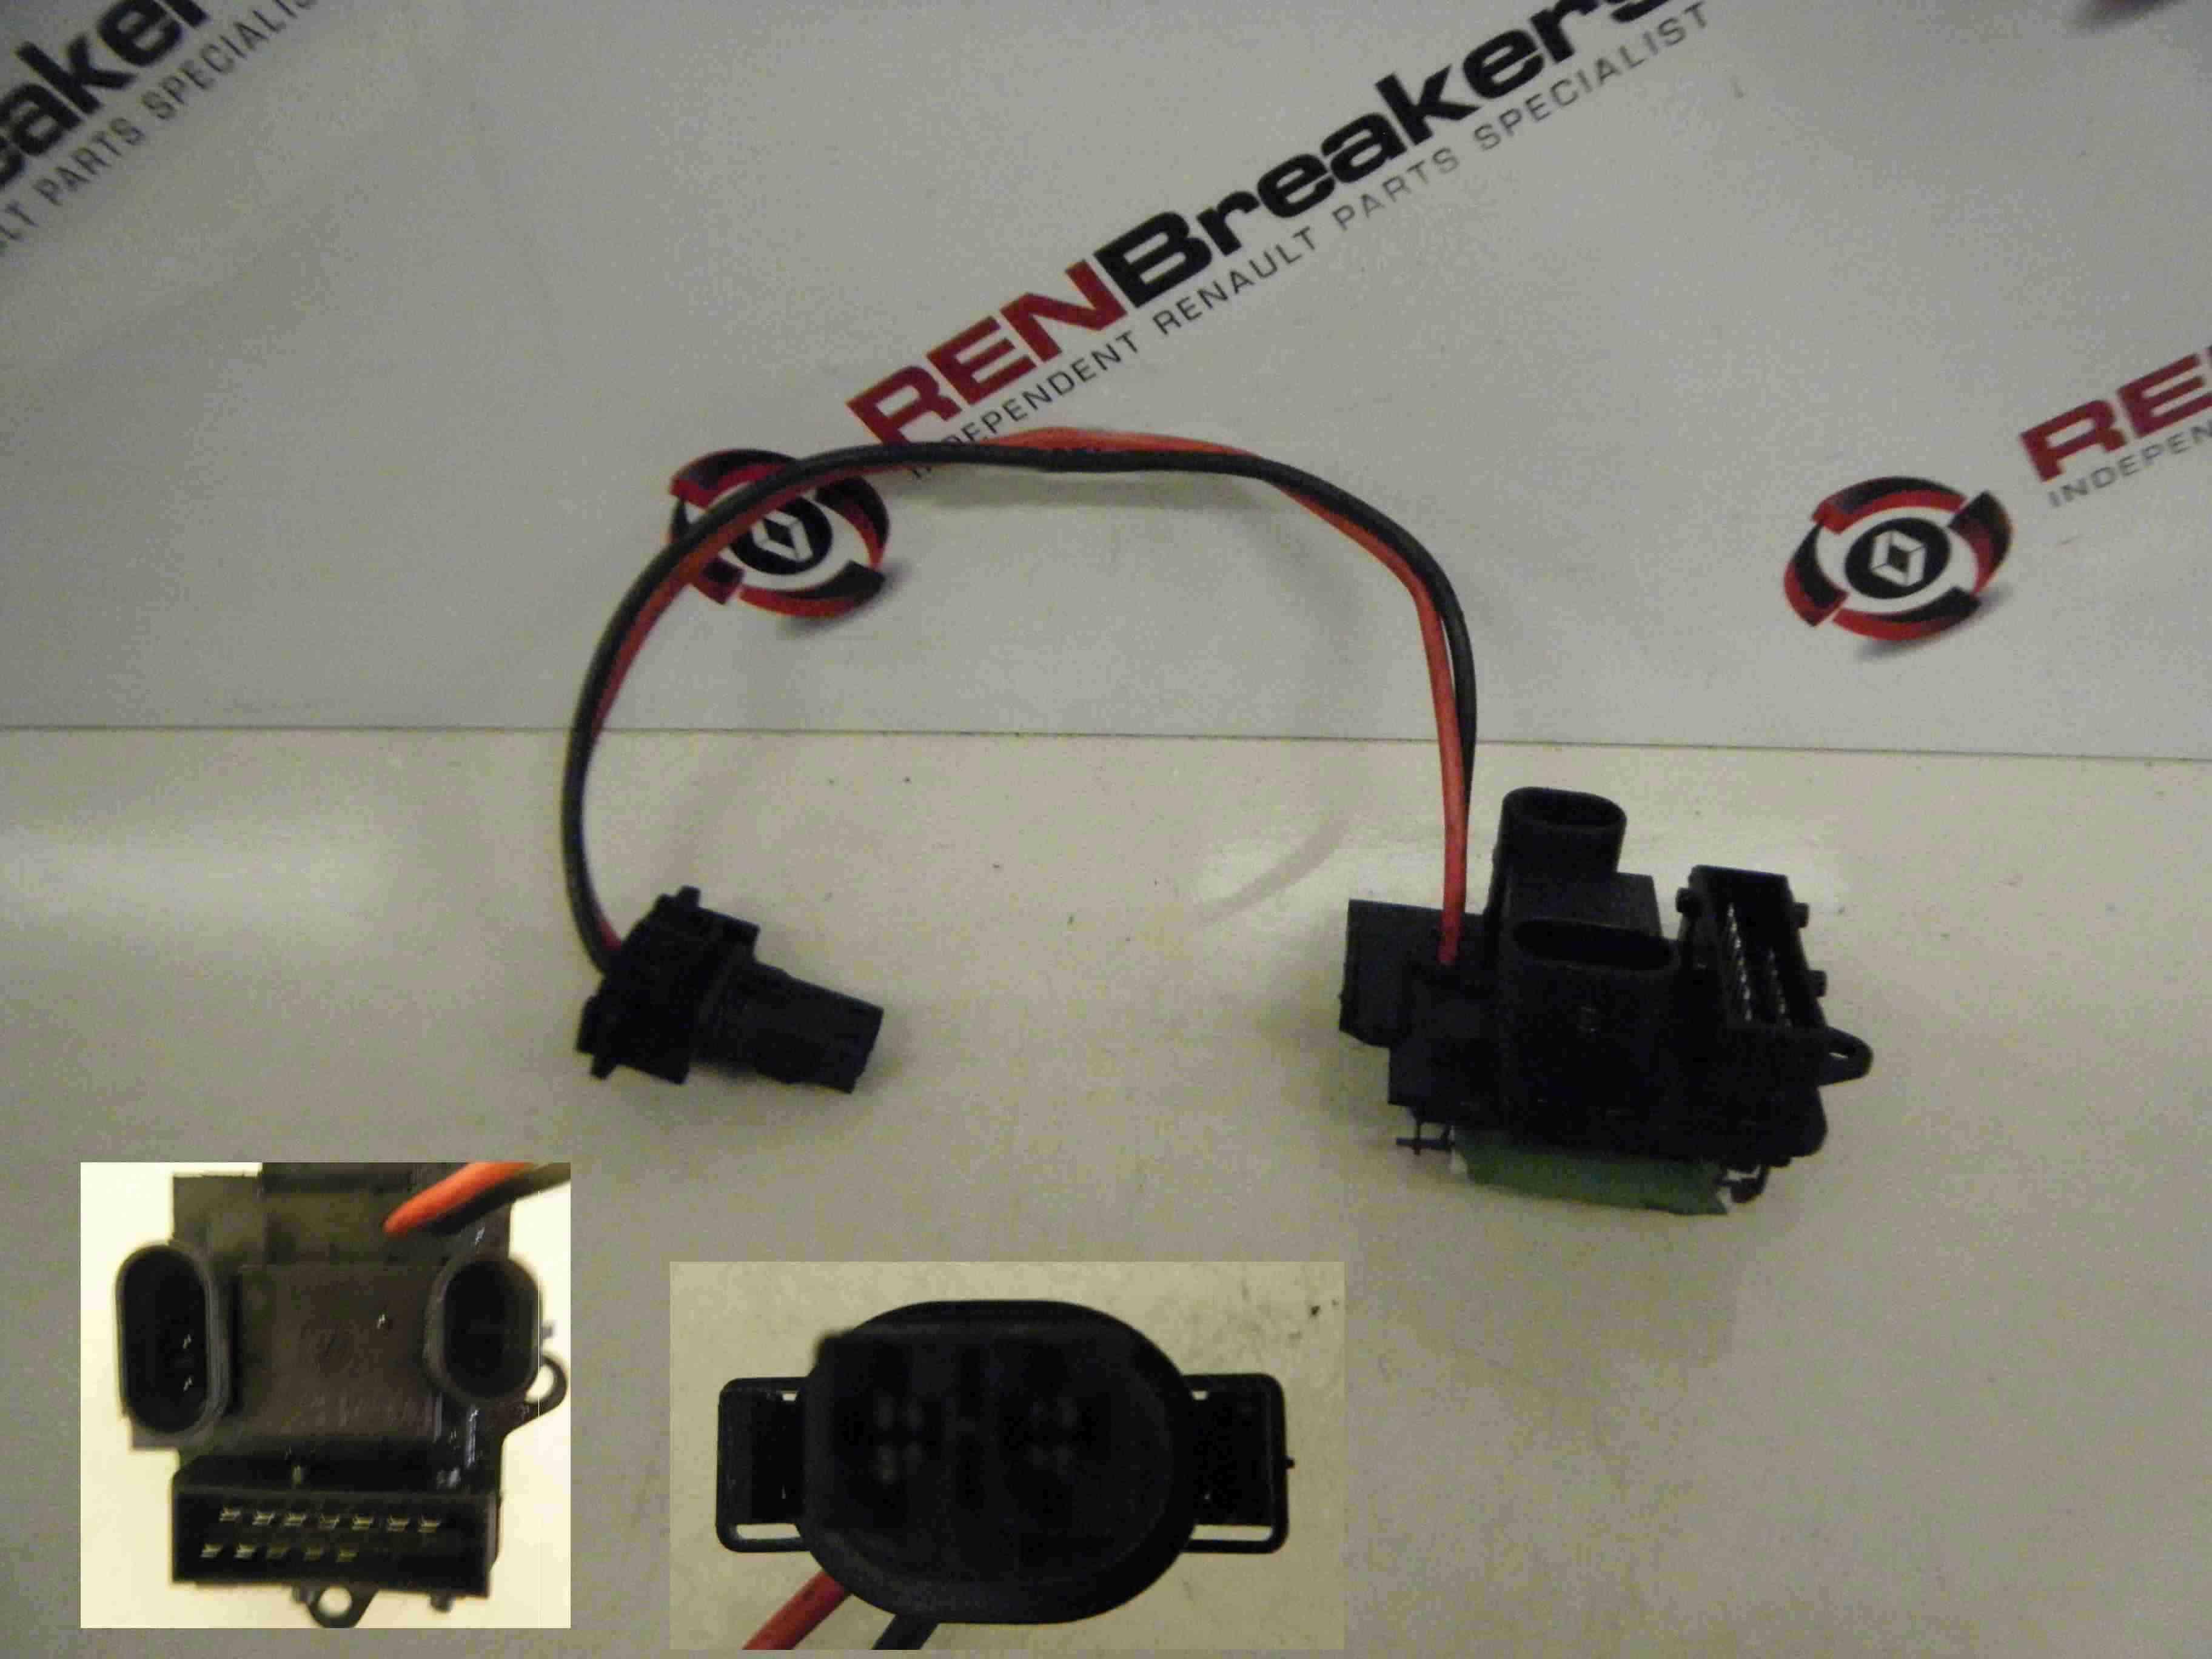 Renault Clio MK2 1998-2001 Heater Blower Motor Resistor